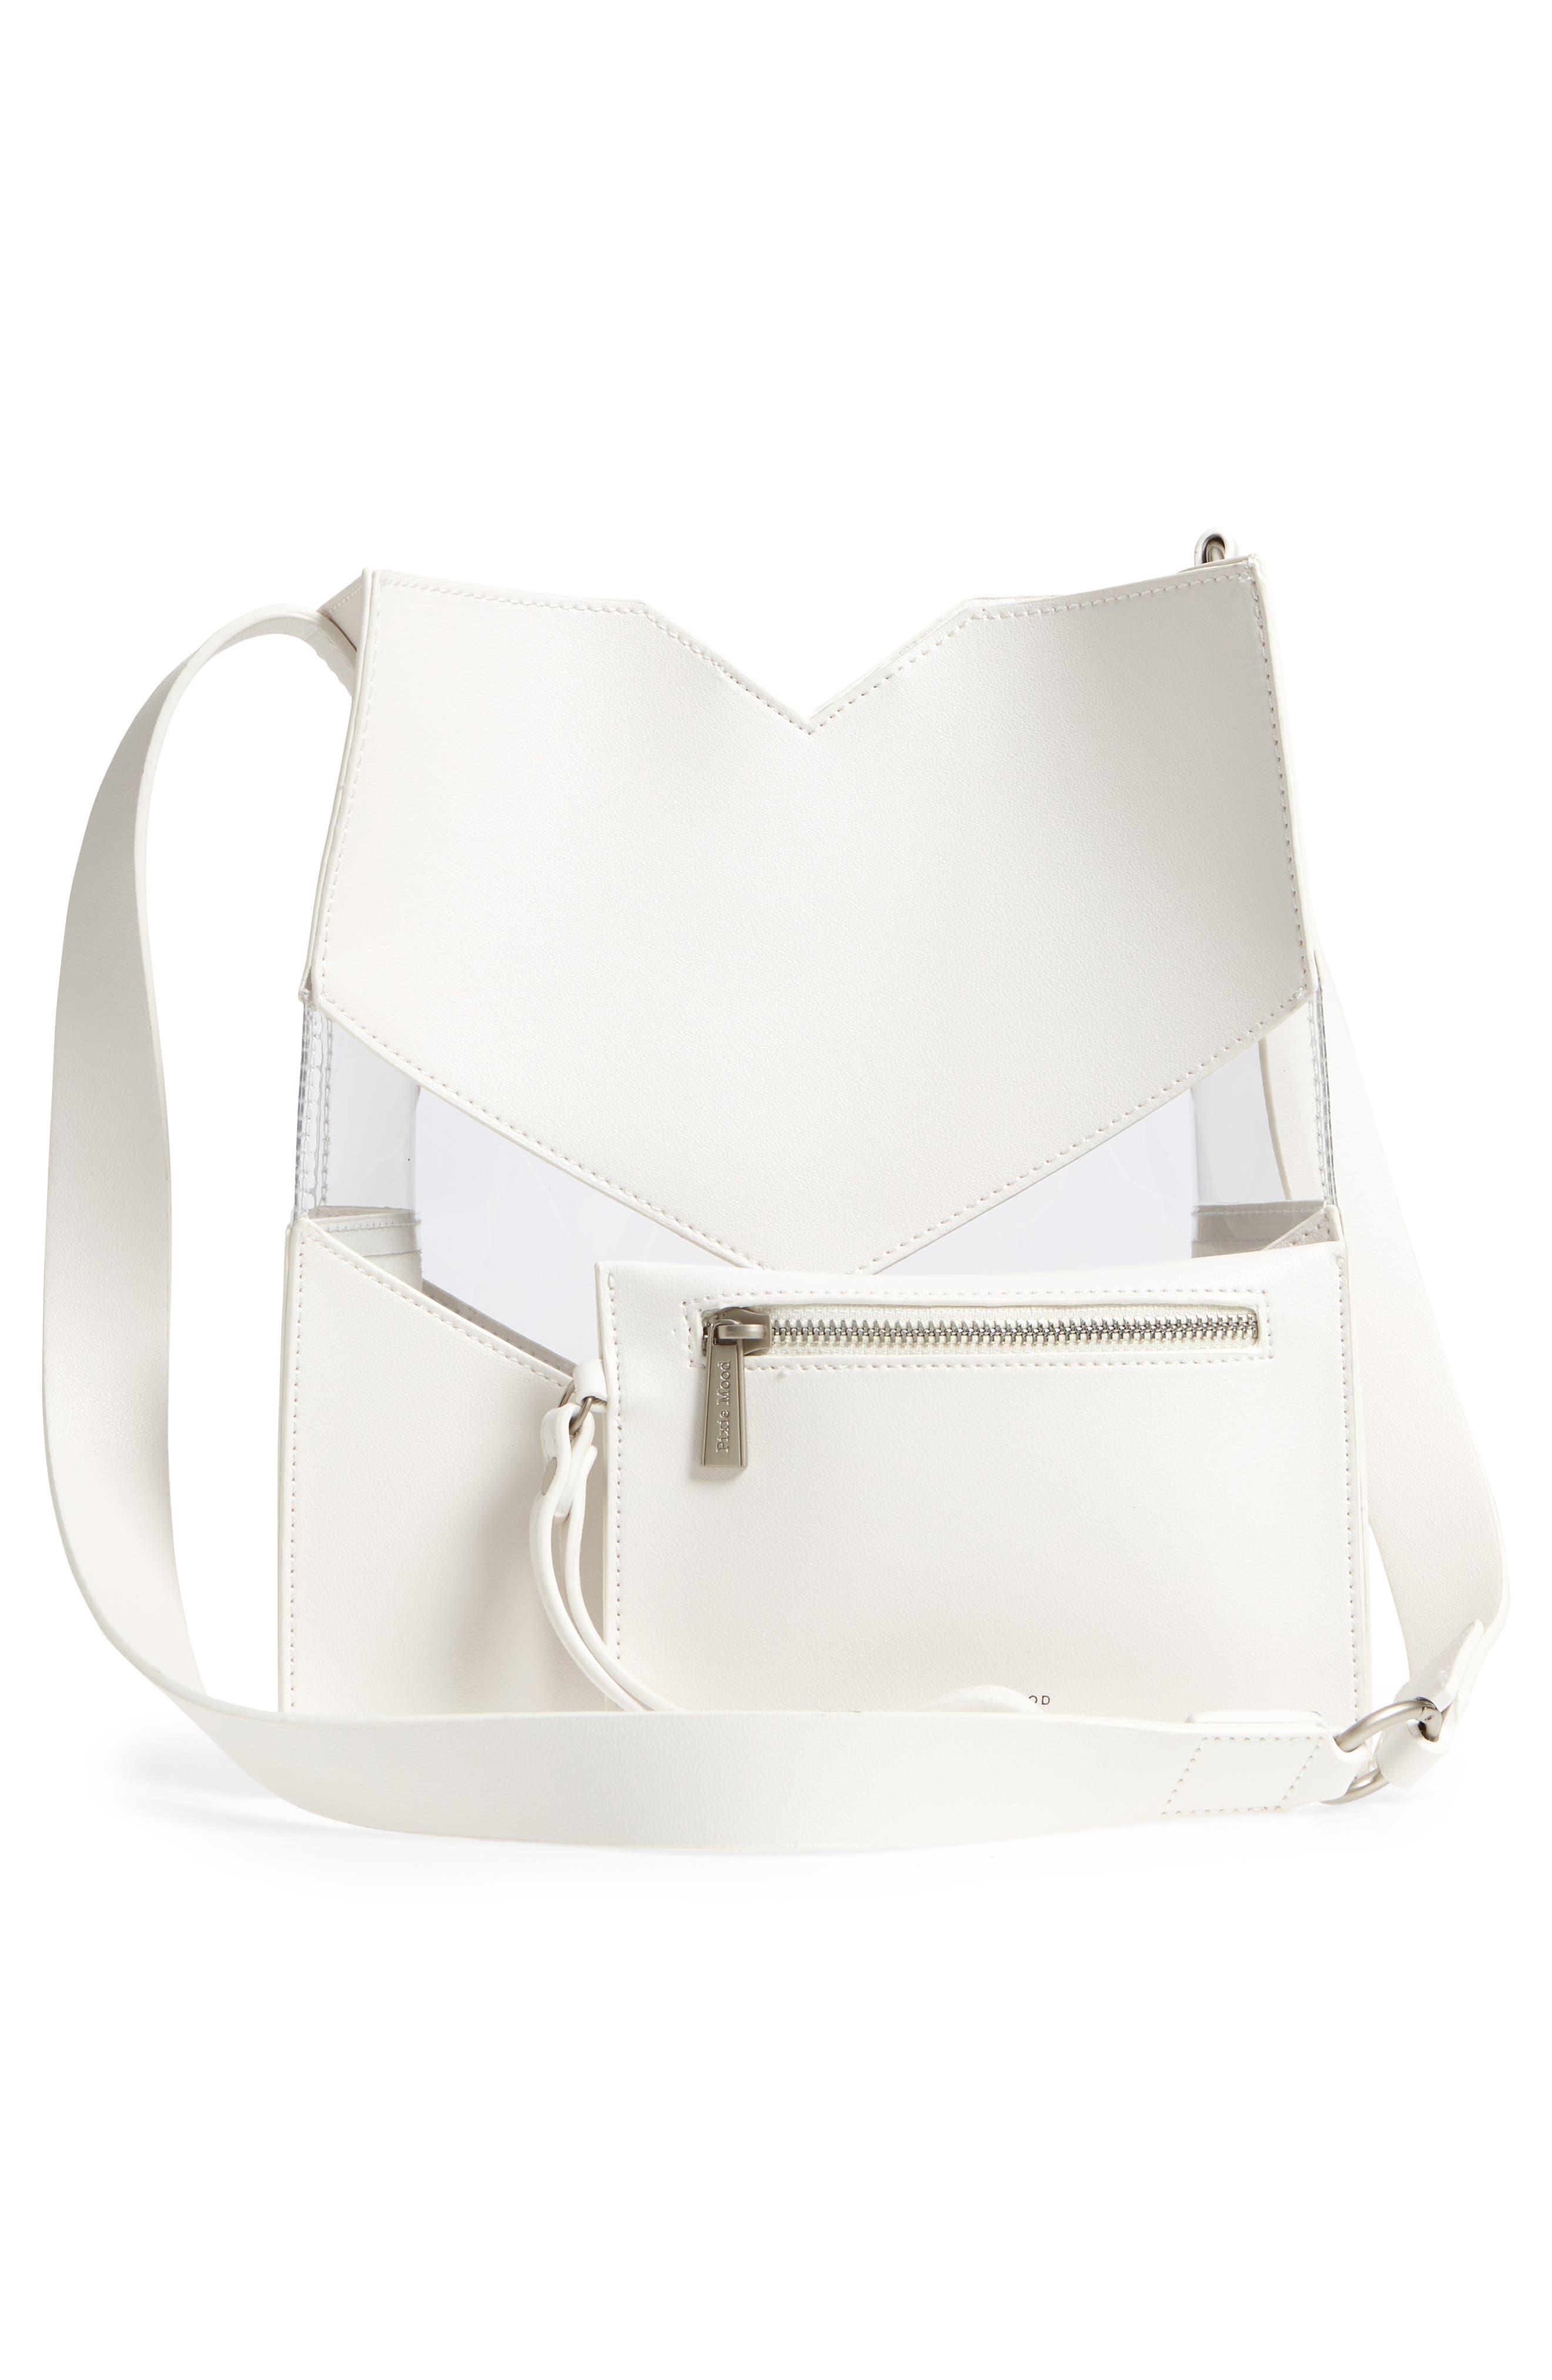 Emily Faux Leather Shoulder Bag,                             Alternate thumbnail 3, color,                             Stark White